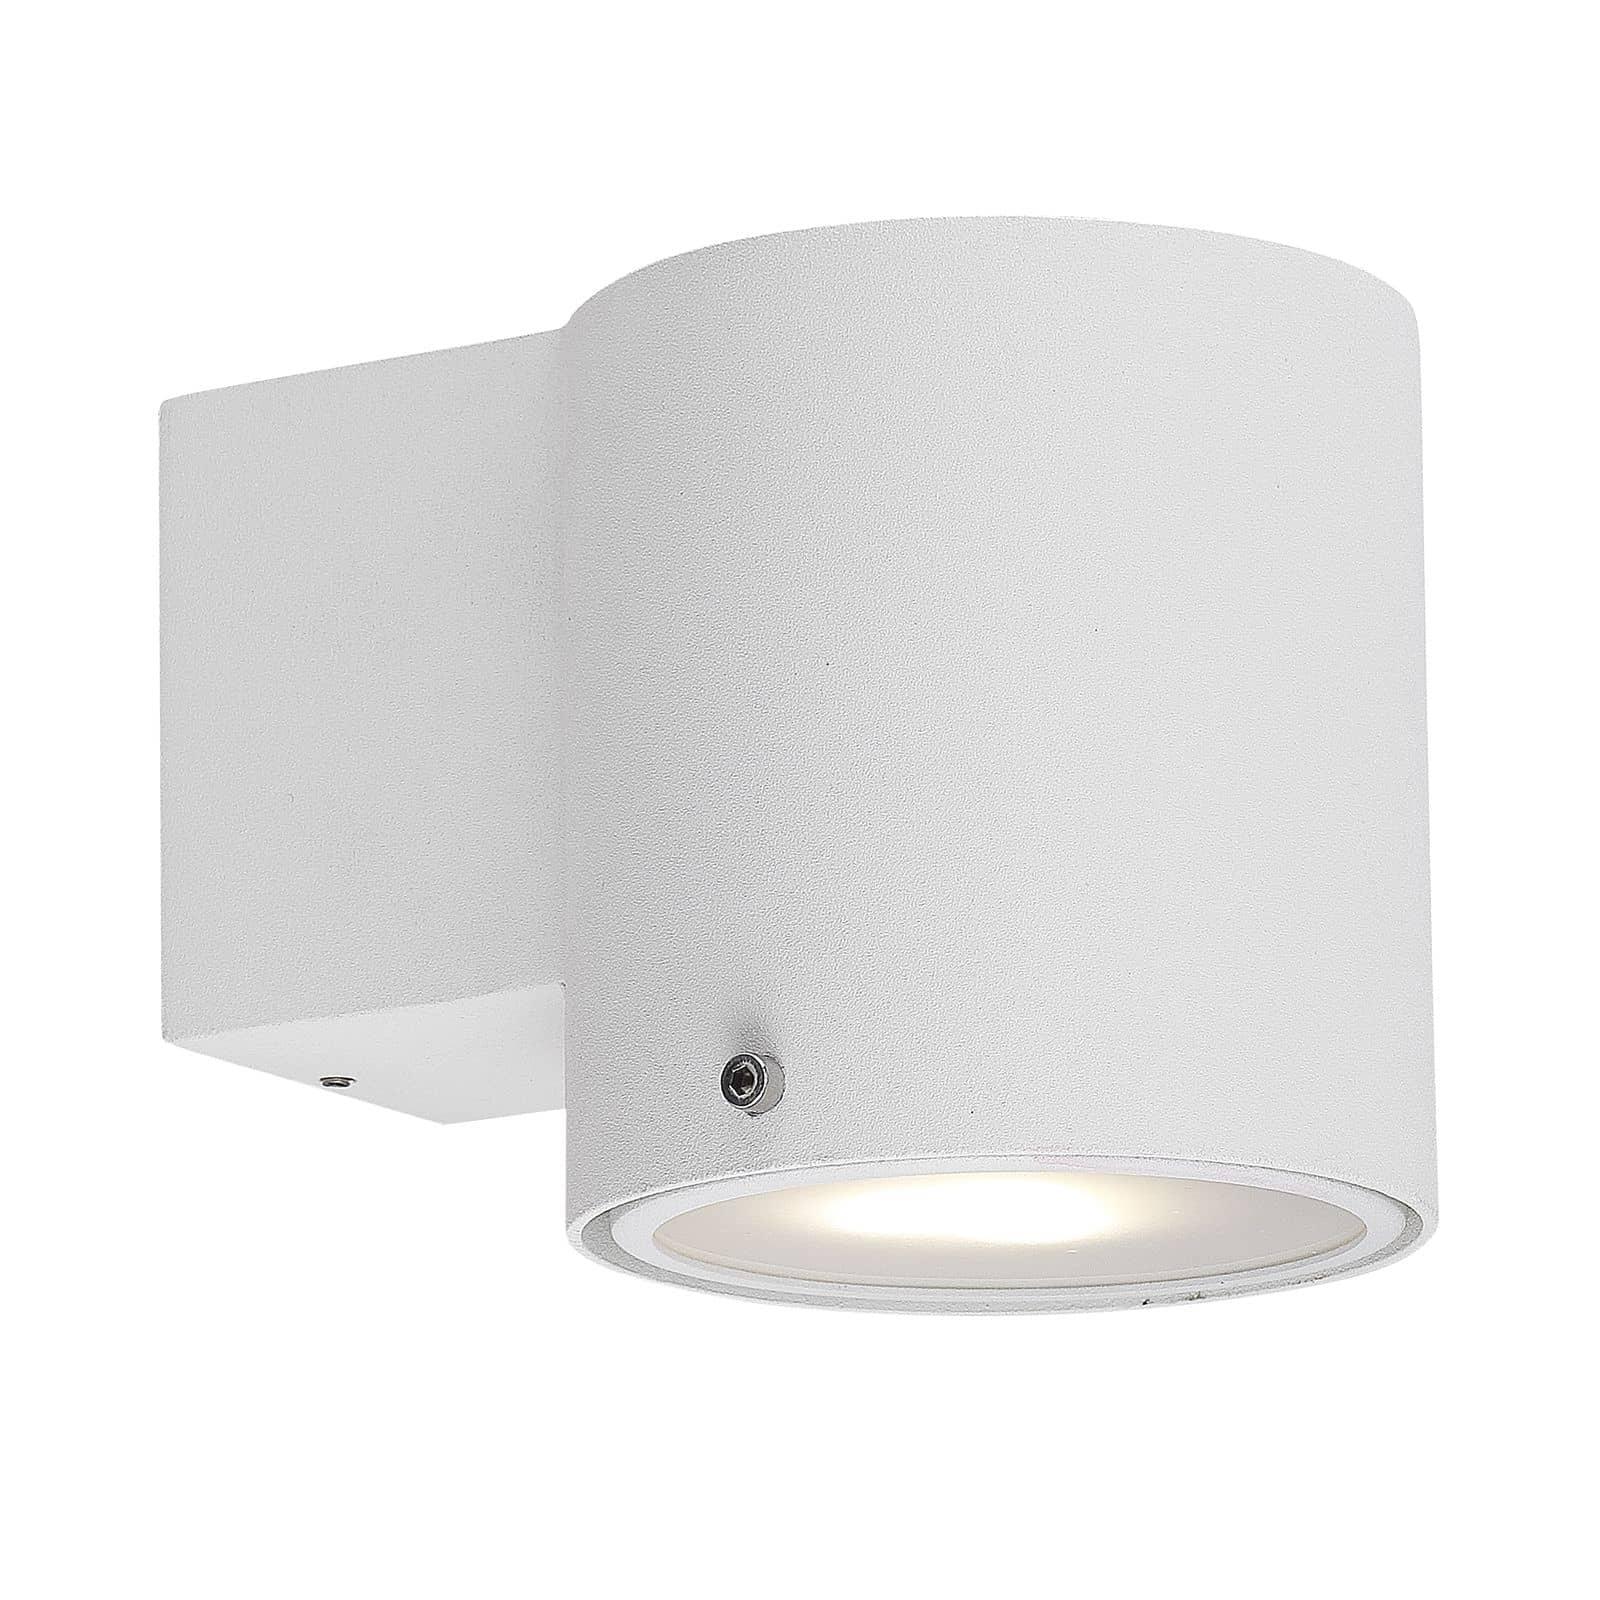 nordlux 78521001 ip s5 wandleuchte gu10 metall weiss ip44. Black Bedroom Furniture Sets. Home Design Ideas